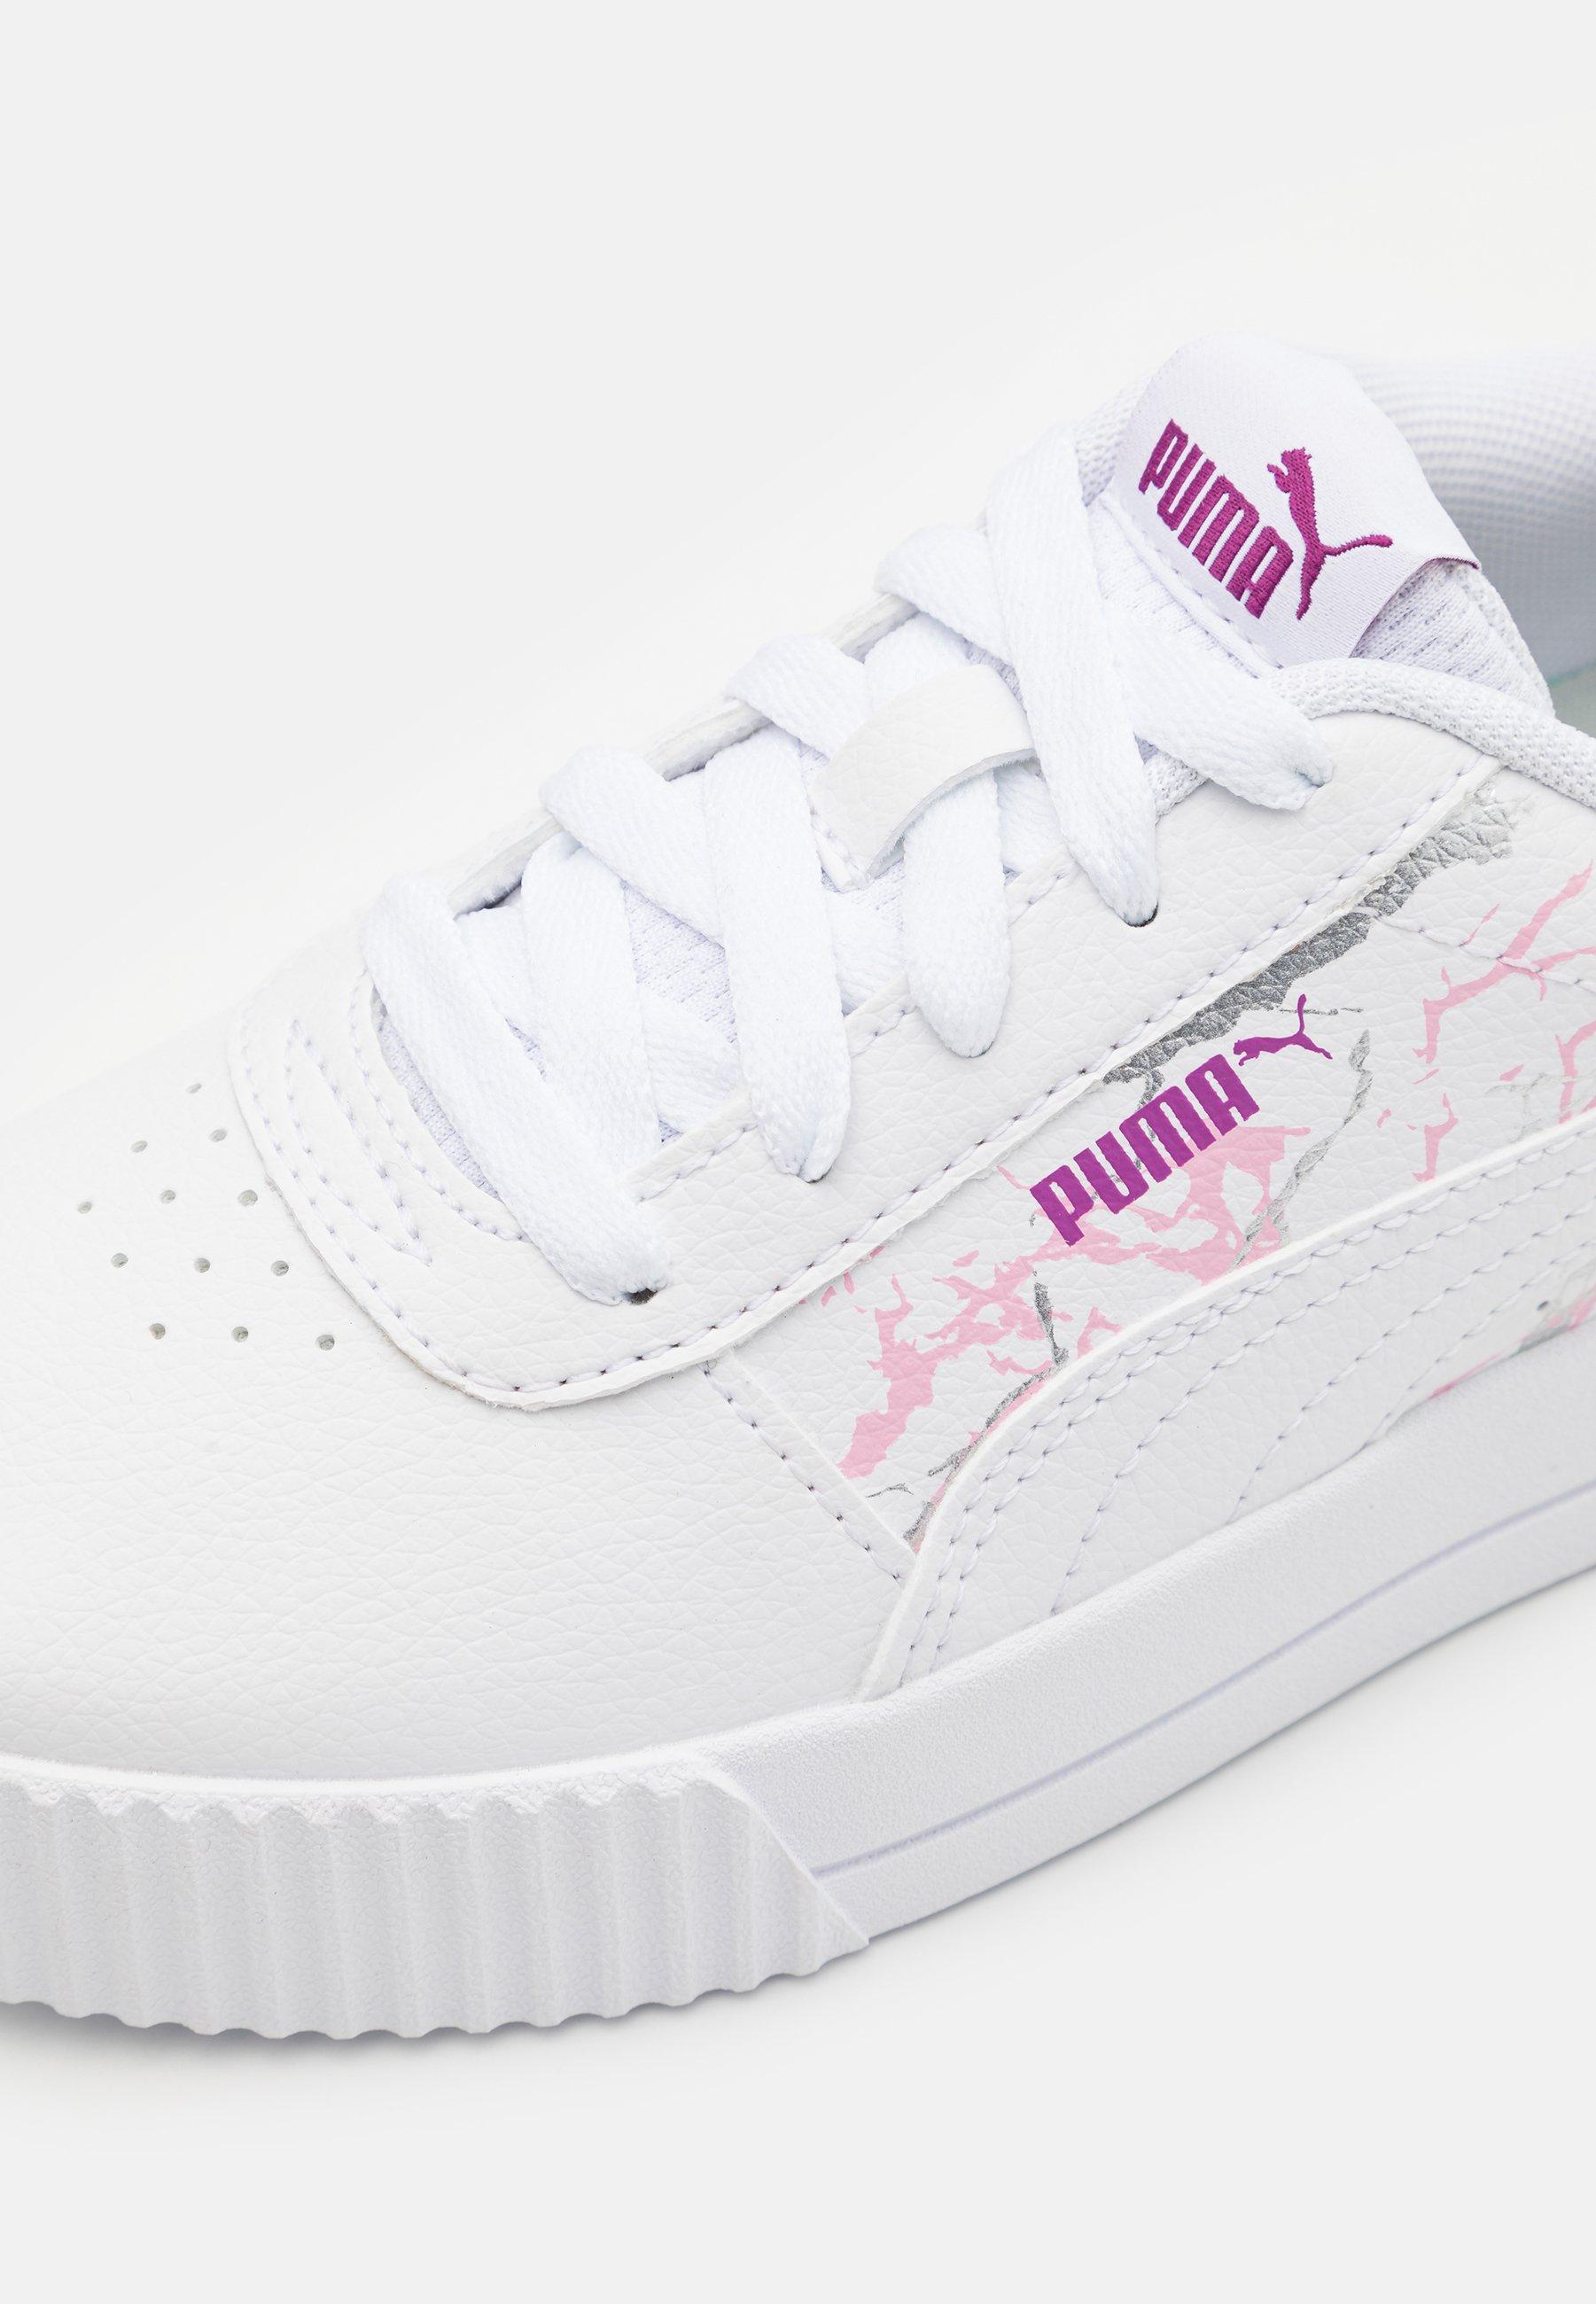 Puma CARINA MARBLE GLITTER - Baskets basses - white/blanc - ZALANDO.FR